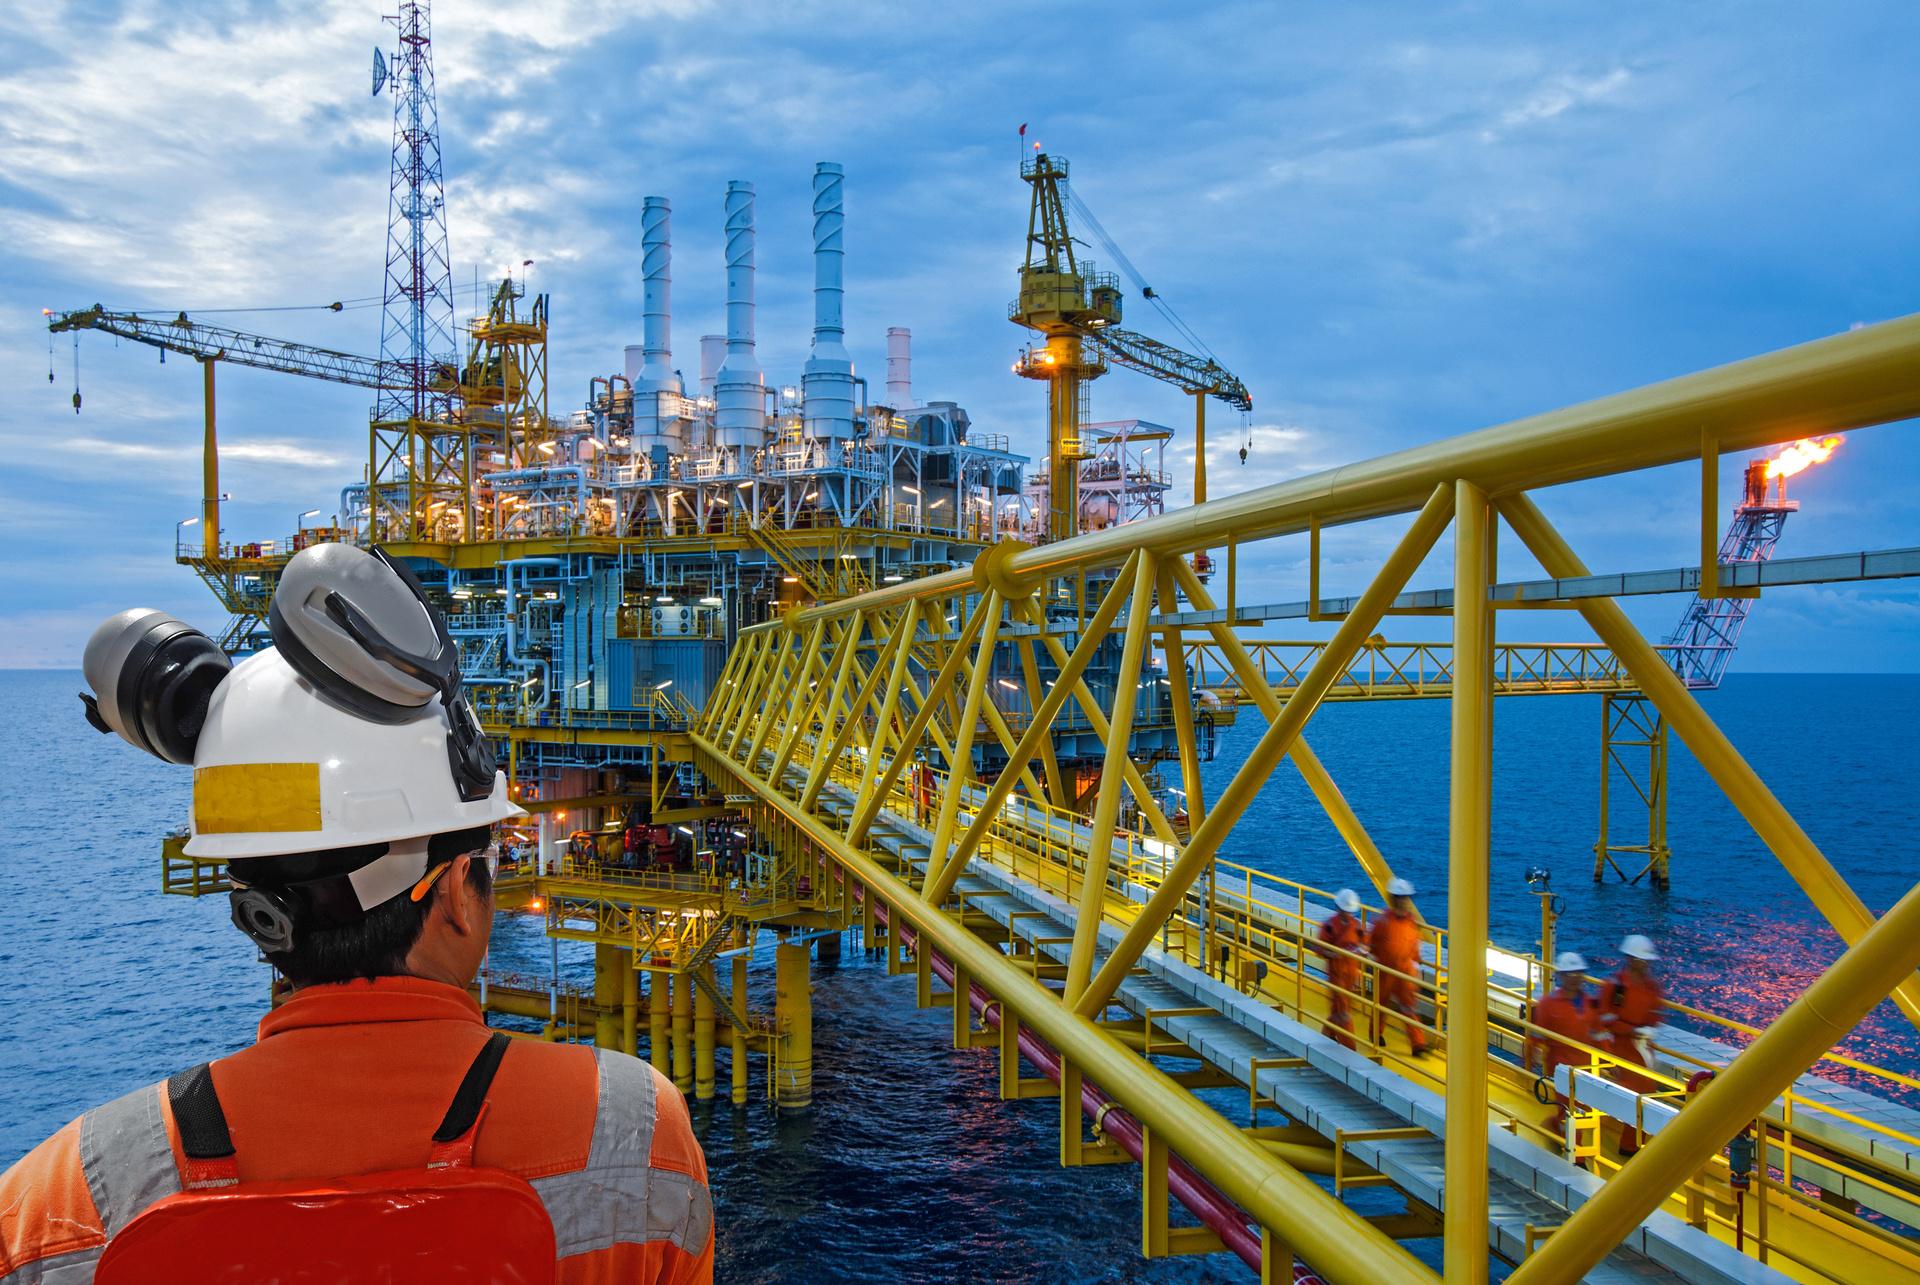 Chevron, Equinor depart NZ exploration scene